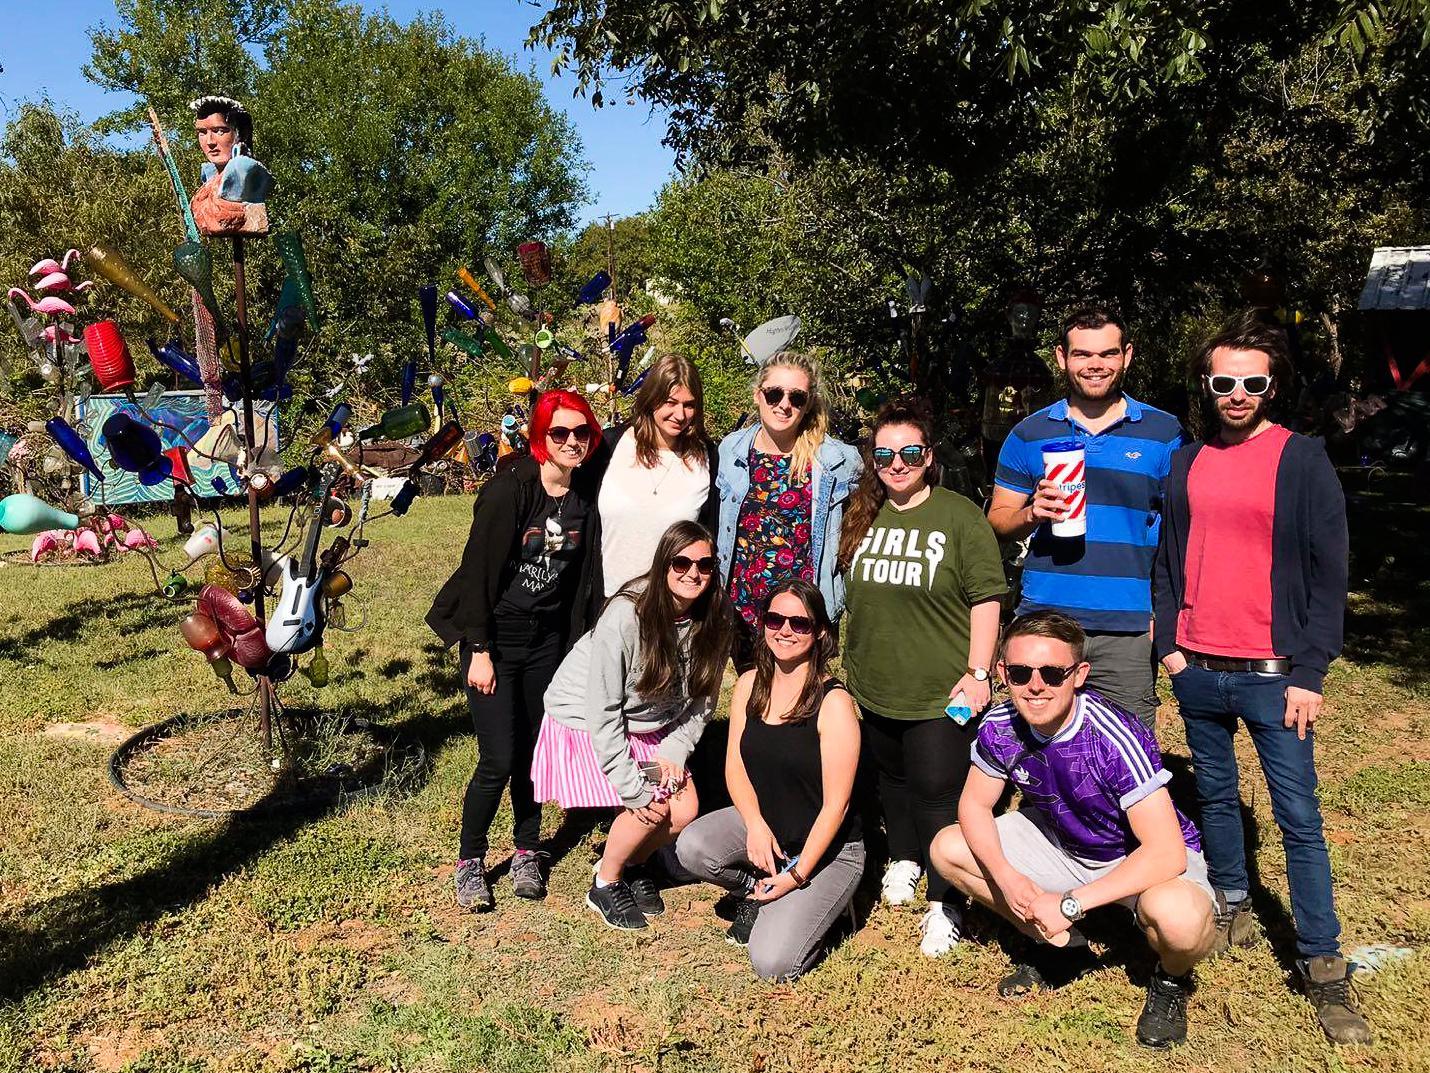 Glass Garden Texas - Rachel Nicole UK Travel Blogger